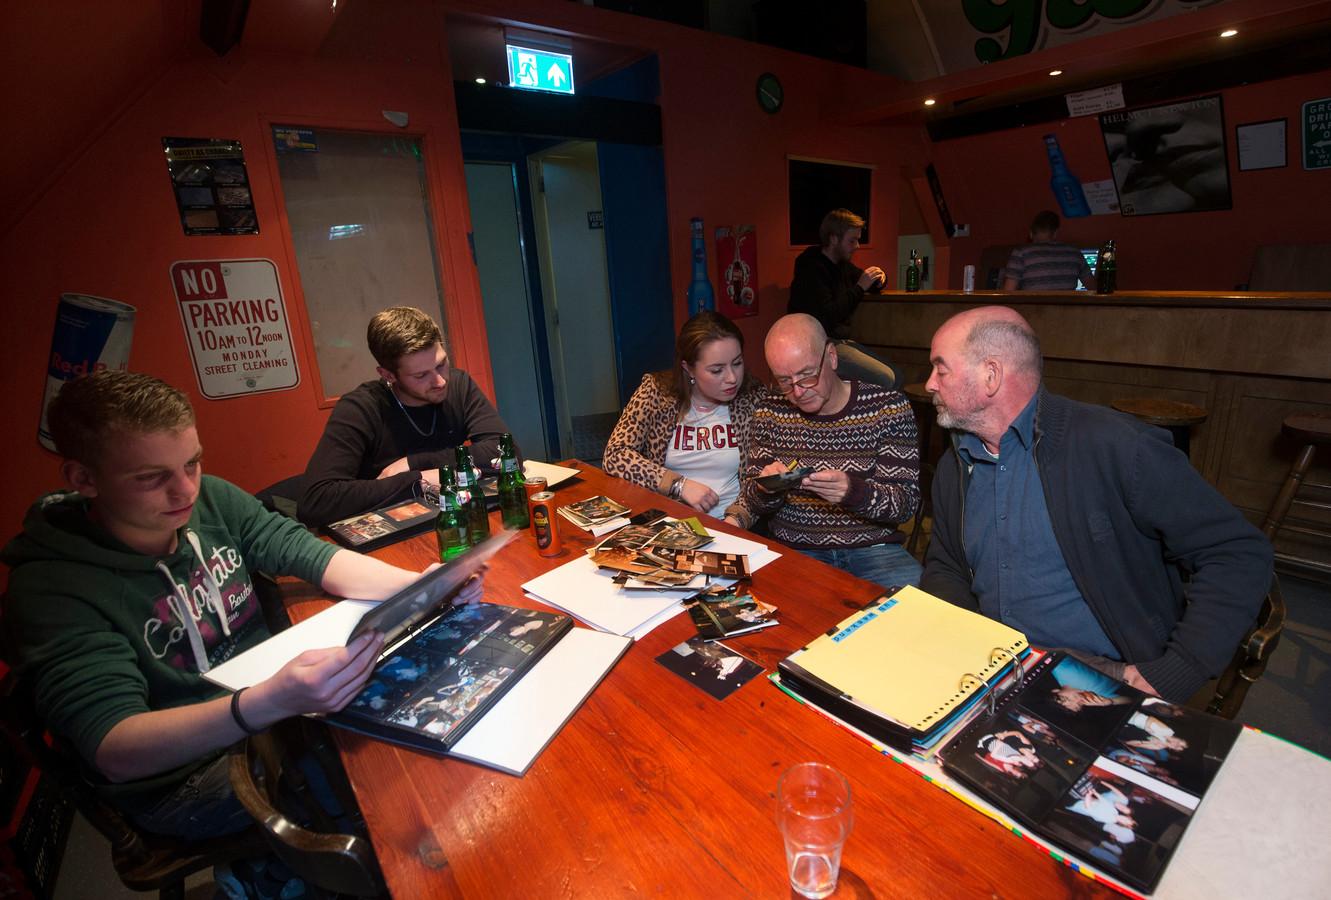 De jubileumwerkgroep bezig met het uitzoeken van foto's voor een wandtentoonstelling, met v.l.n.r. Siebe Wevers, Rutger Hoefman, Sanne Oonk, Bart Oonk en André Temming.